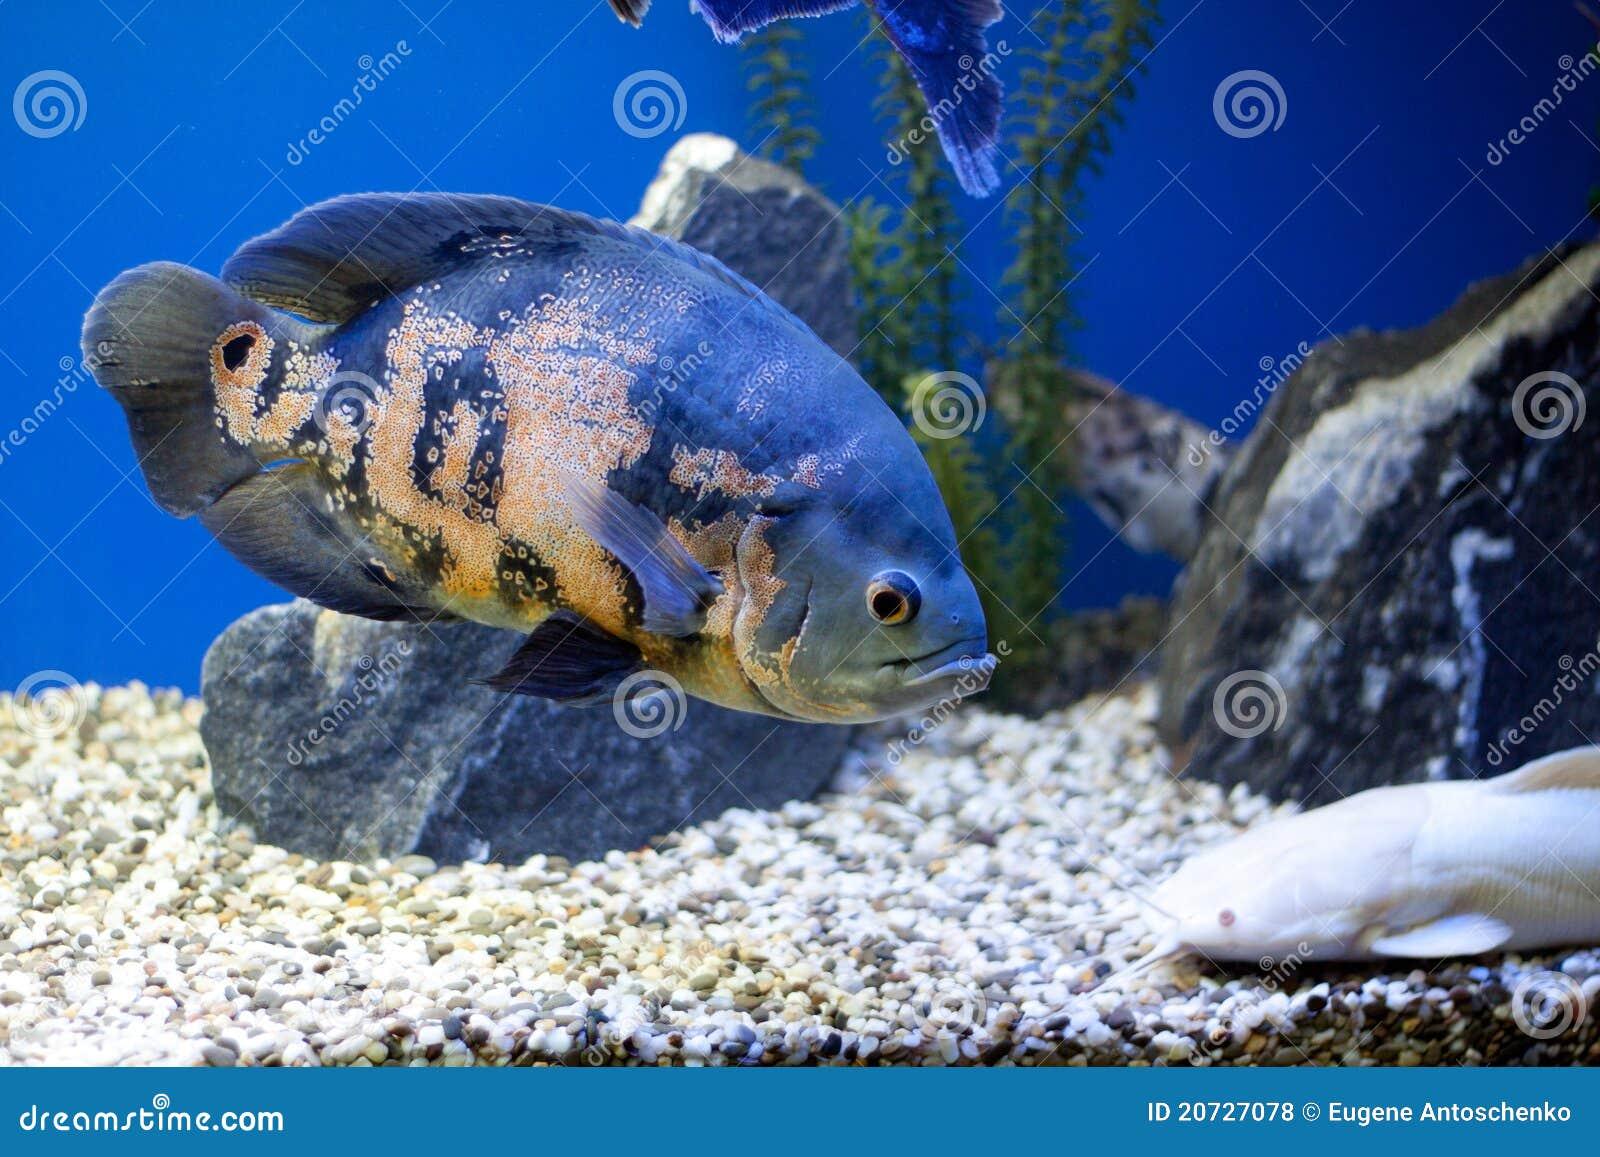 Big Blue Fish Underwater Royalty Free Stock Photos Image